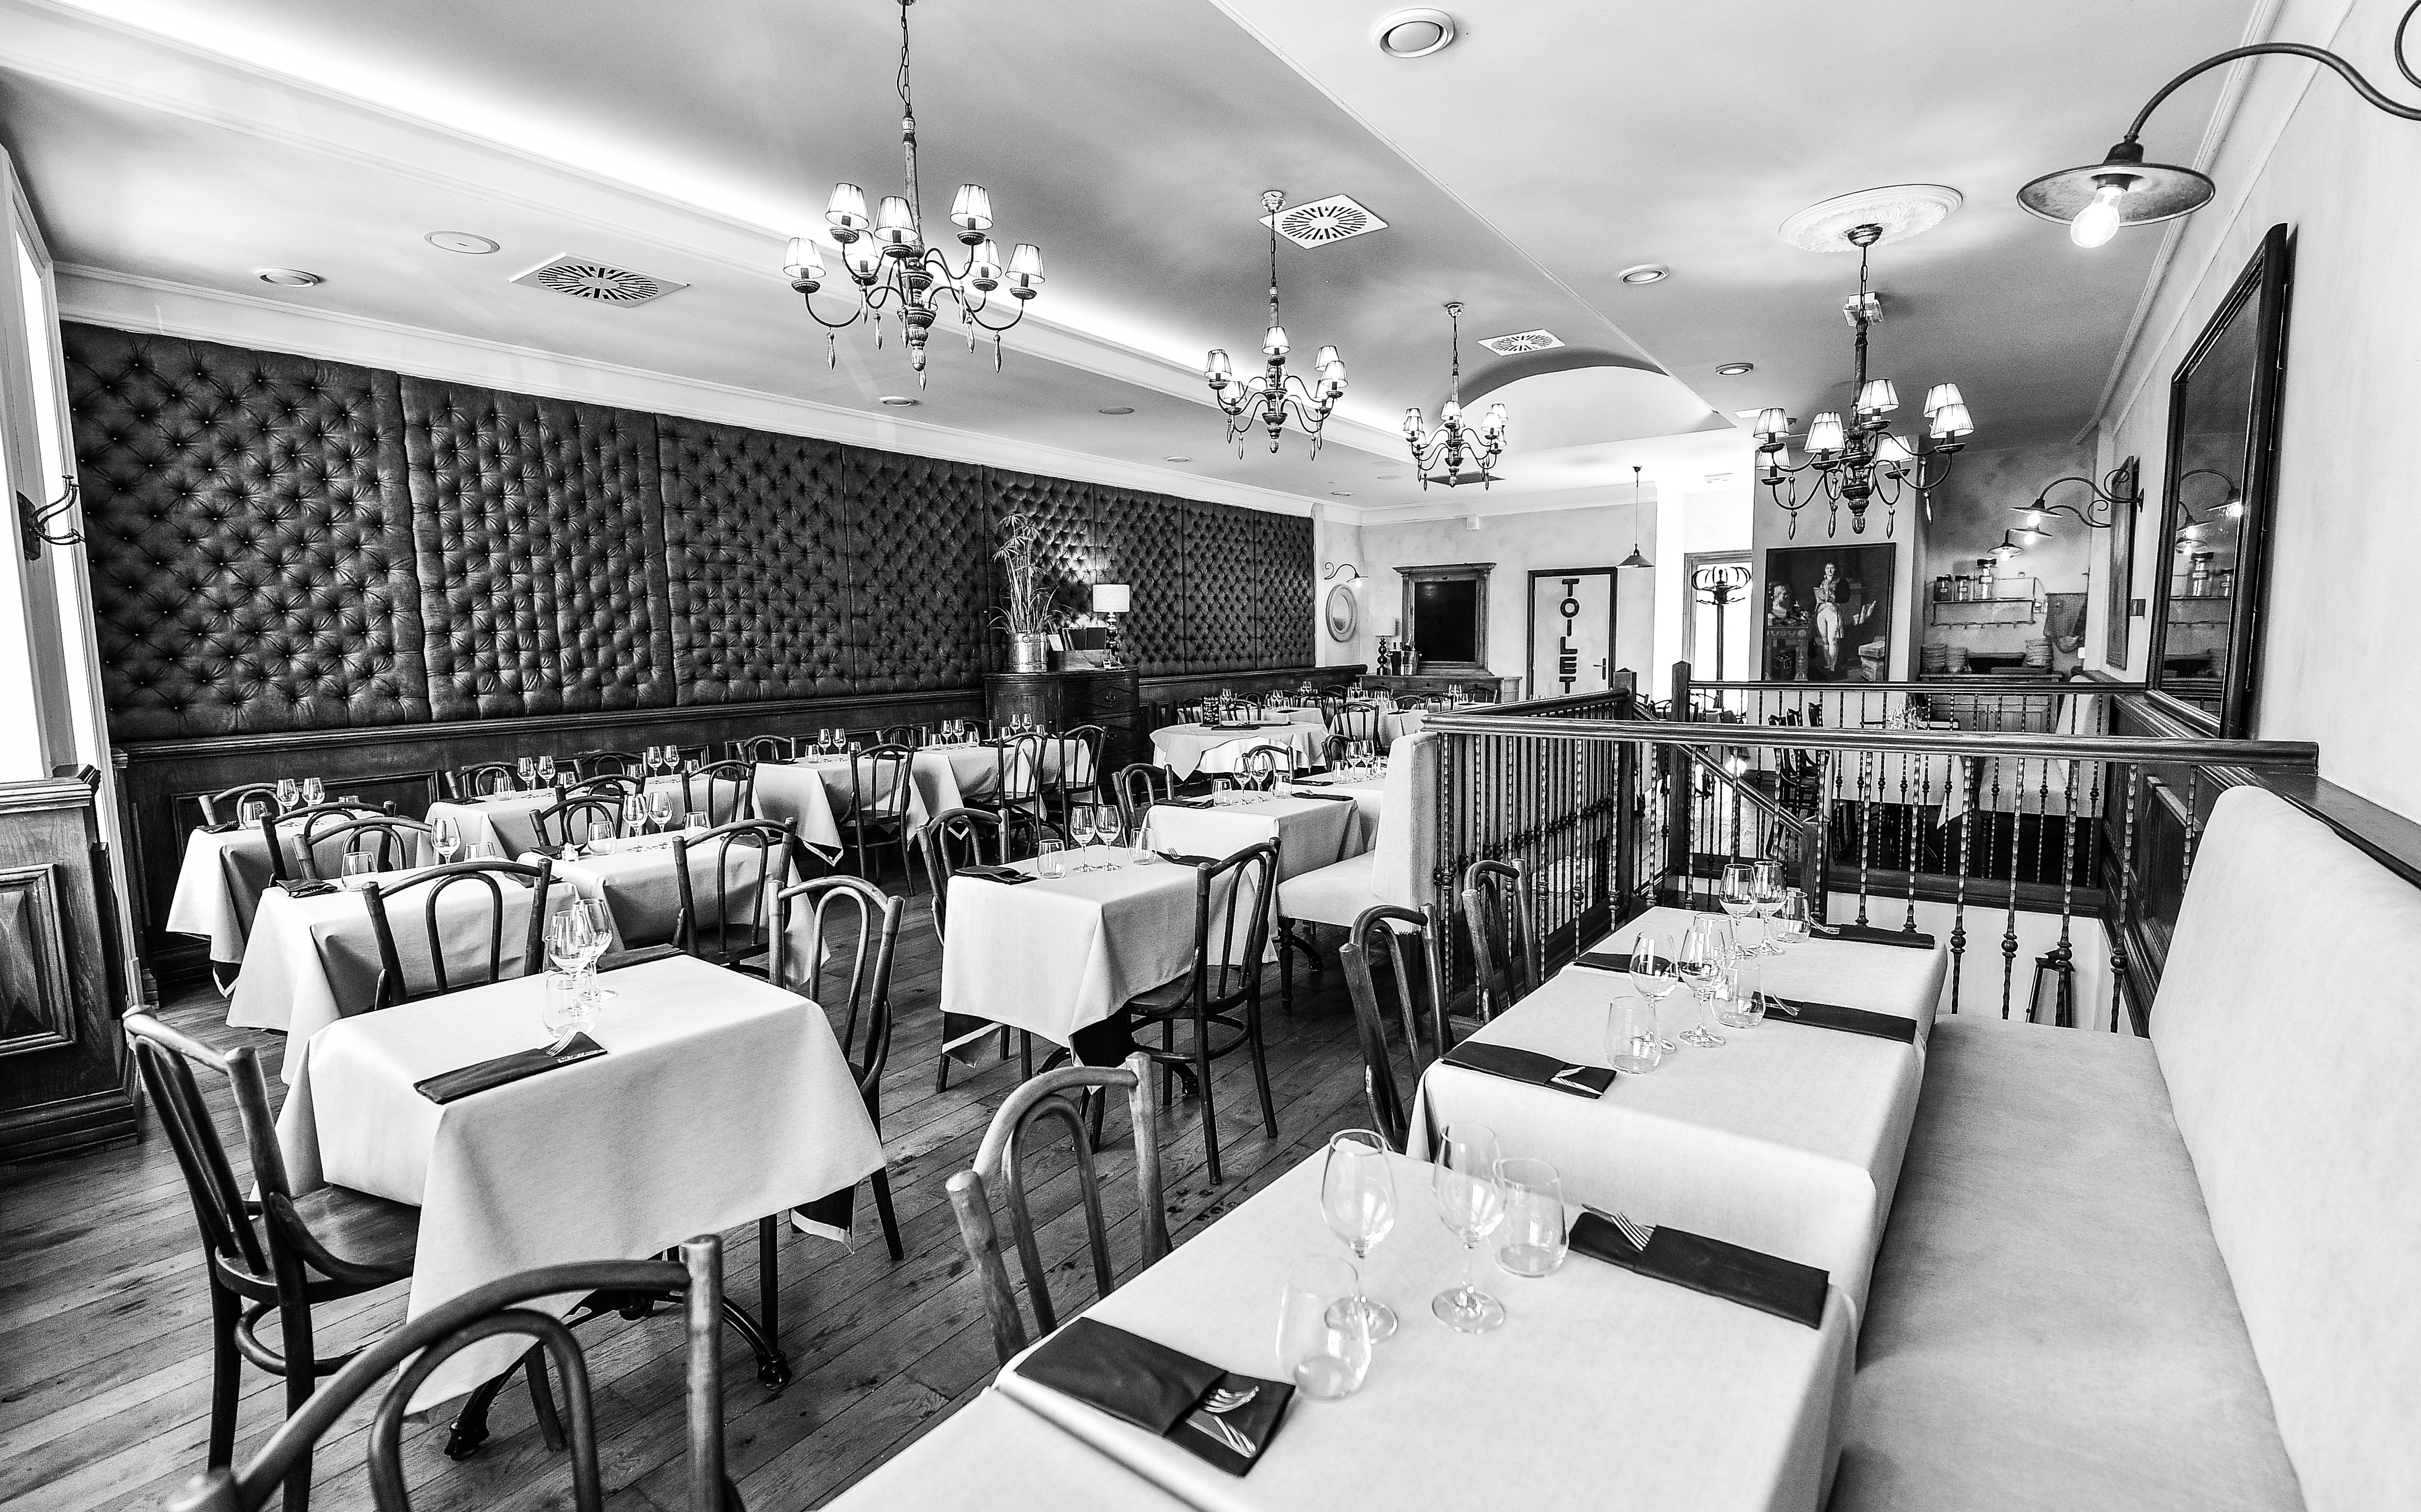 Brasserie Restaurant Place Carnot Beaune